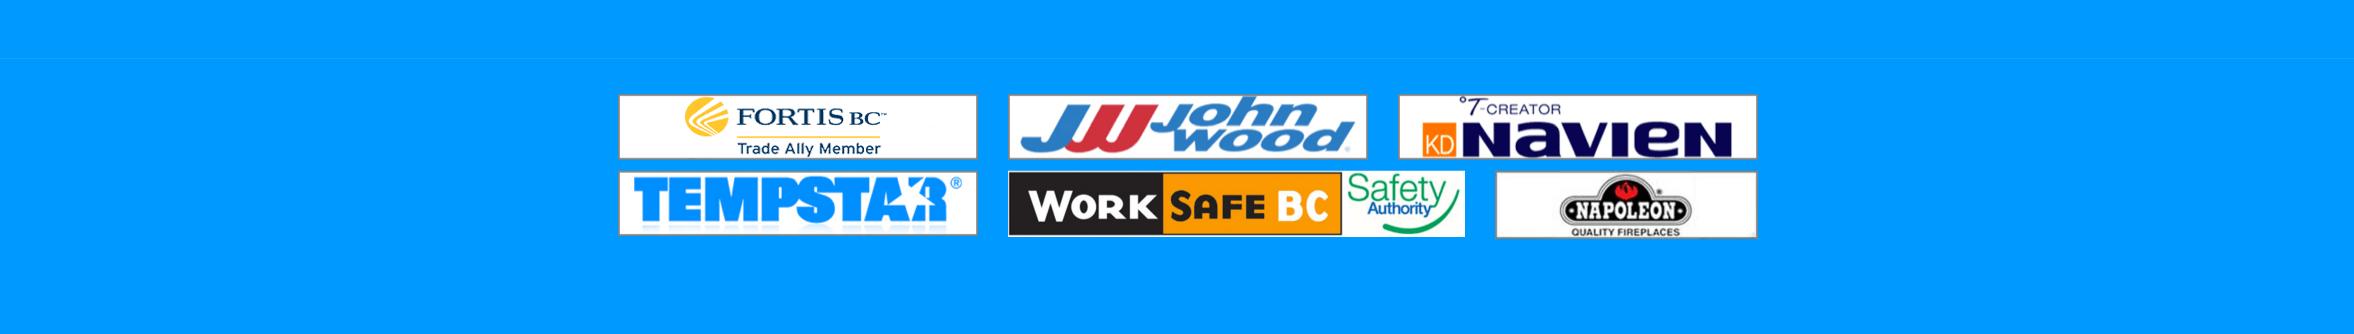 Vortech Plumbing works with Fortis BC, Tempstar, JJJ John Wood, Worksafe BC, Napolean, Navien